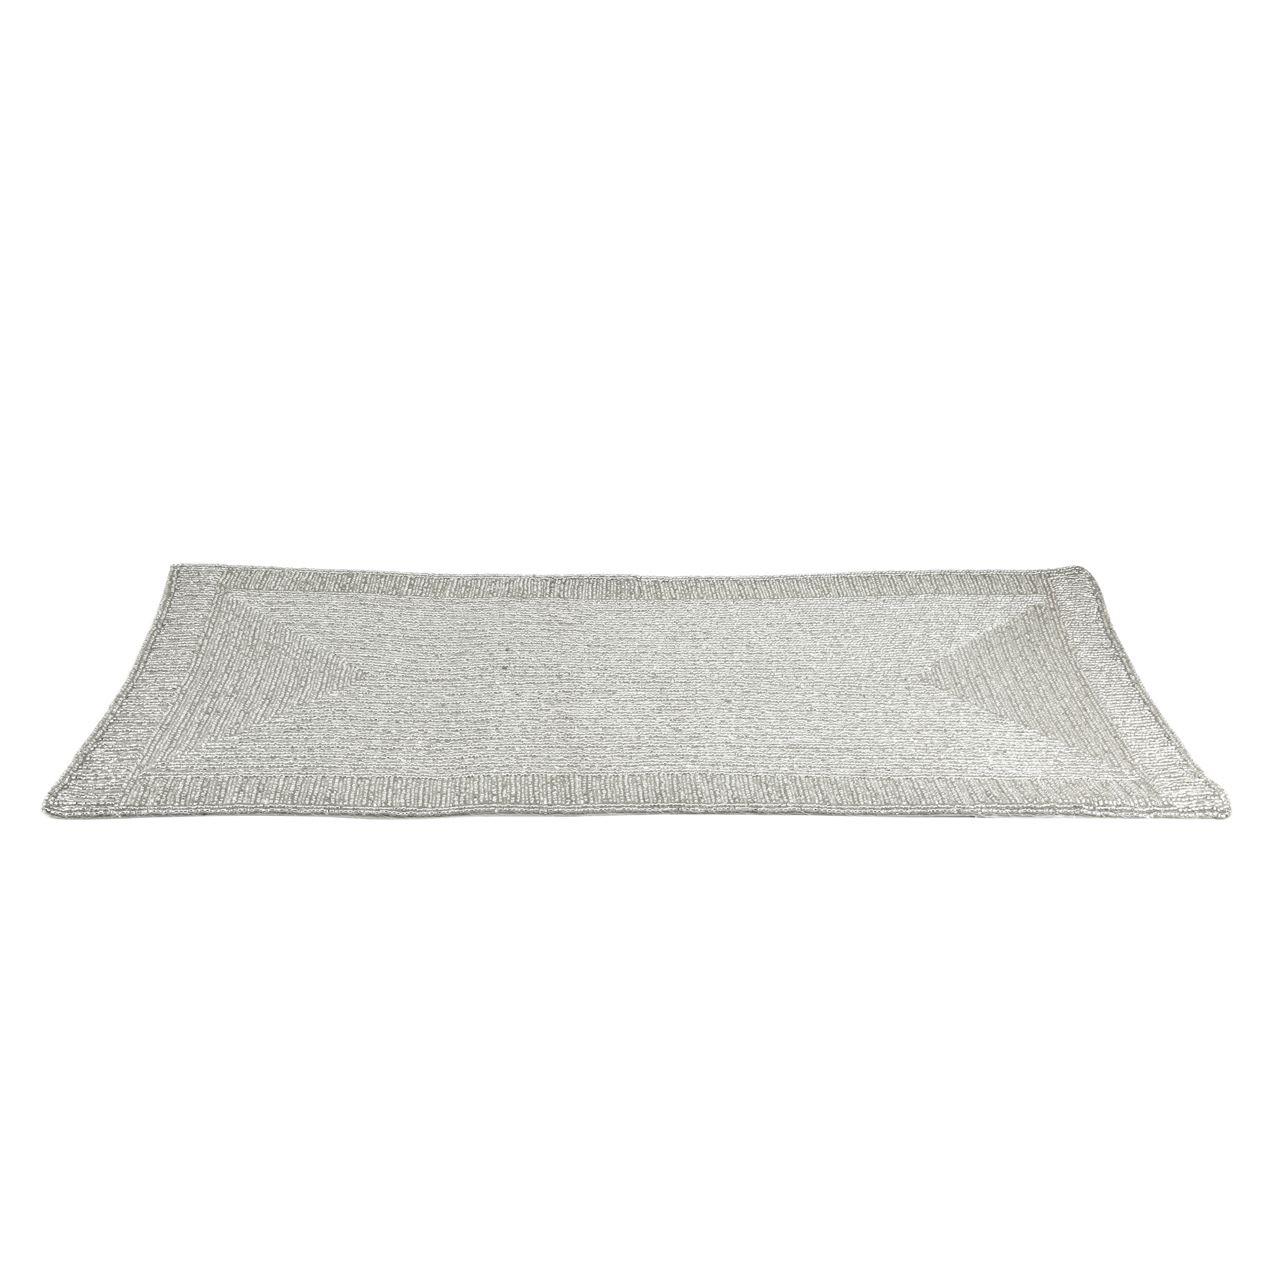 Silver Emboidered Table Runner